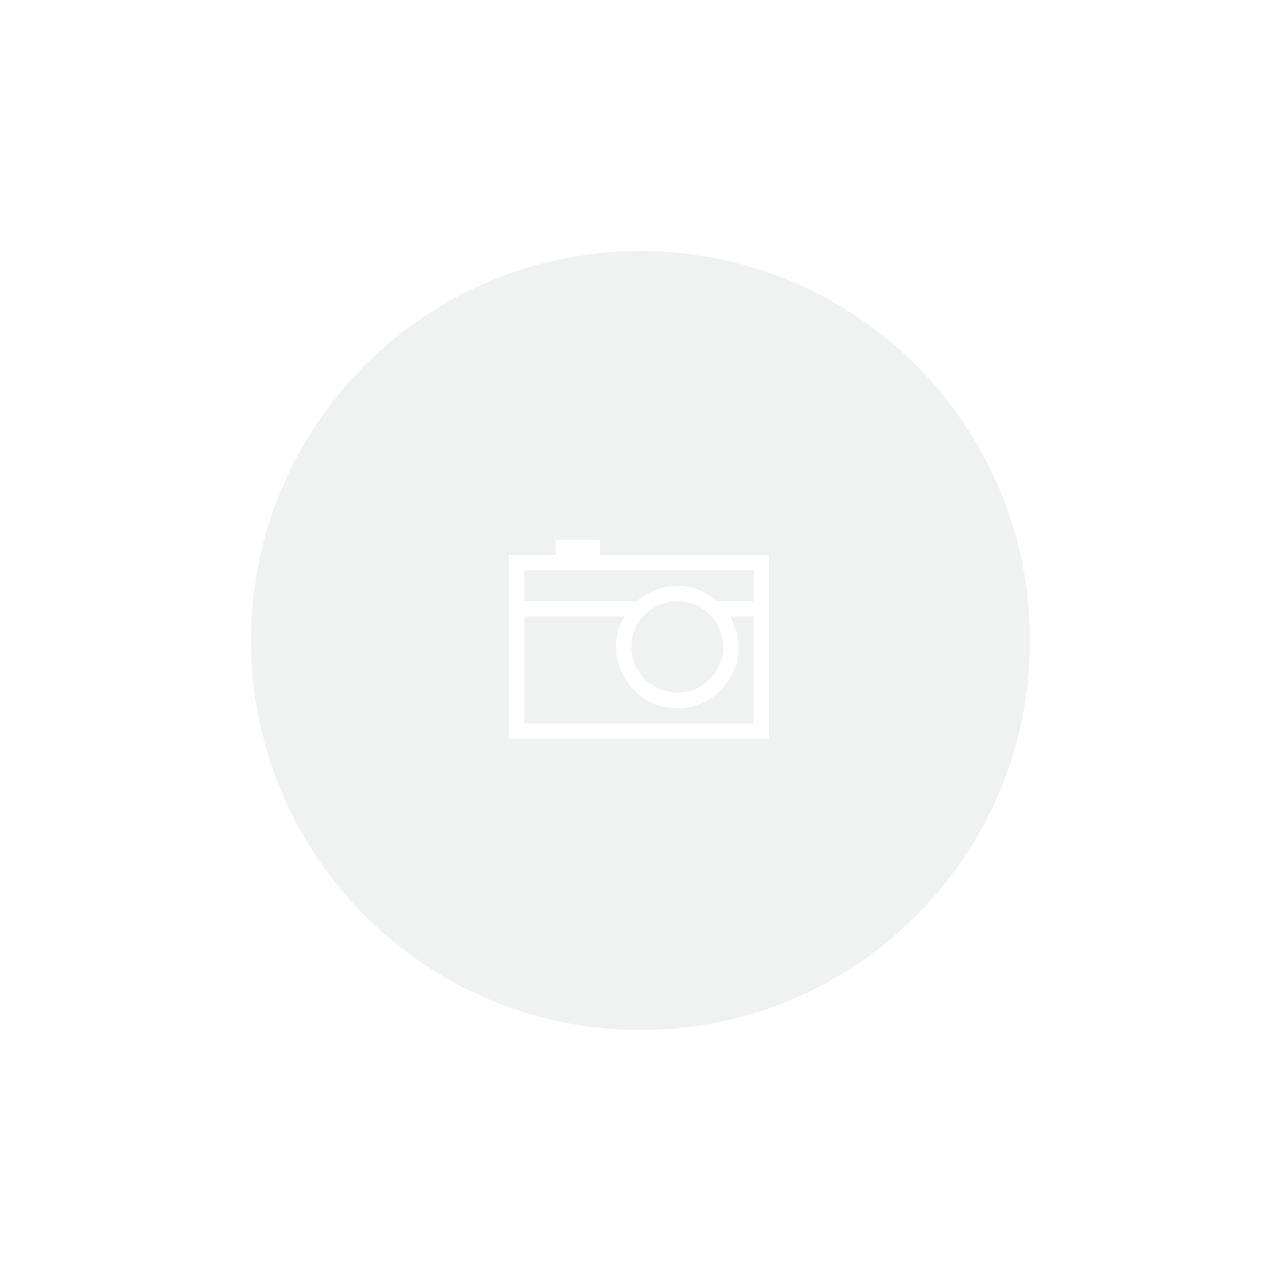 Gel Decapante e Passivante p/ Inox 4x1,2 Kg